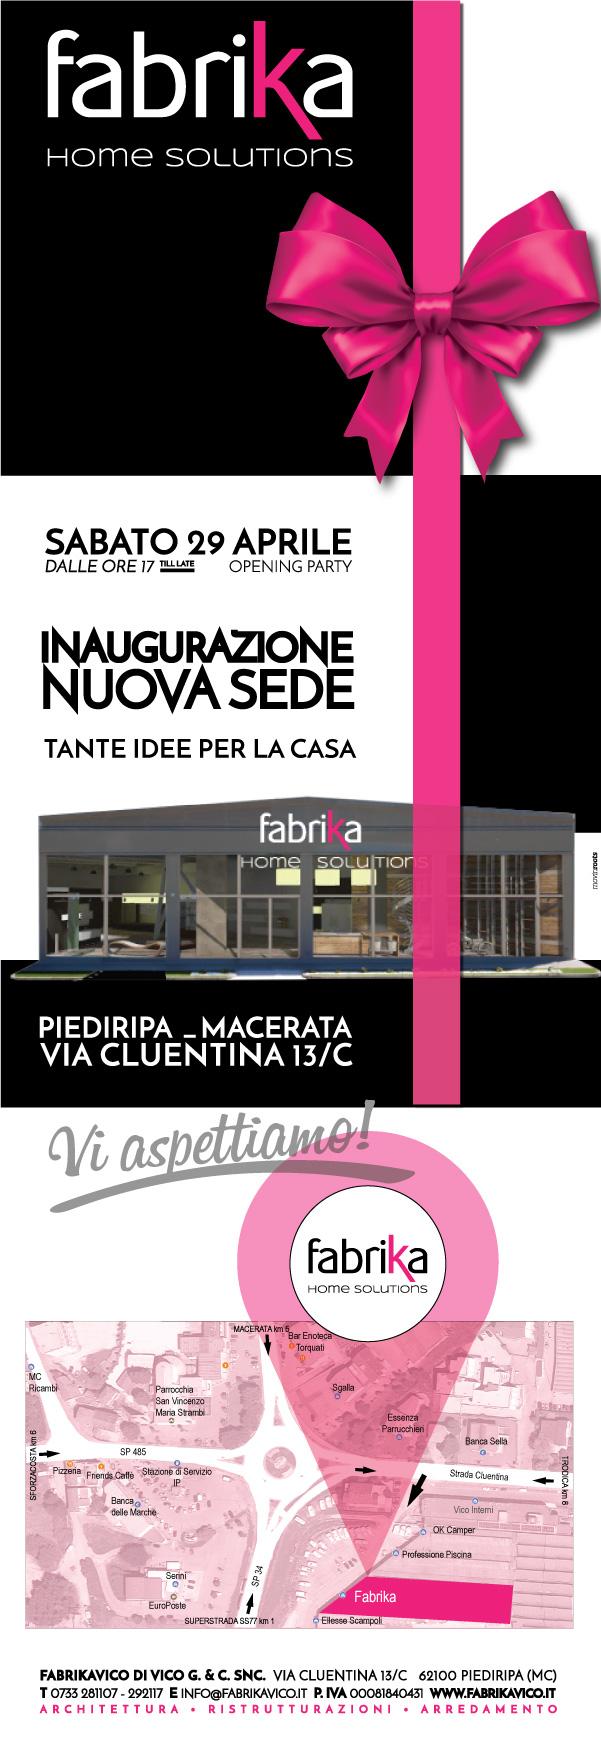 FABRIKA home solutions Macerata Piediripa inaugurazione